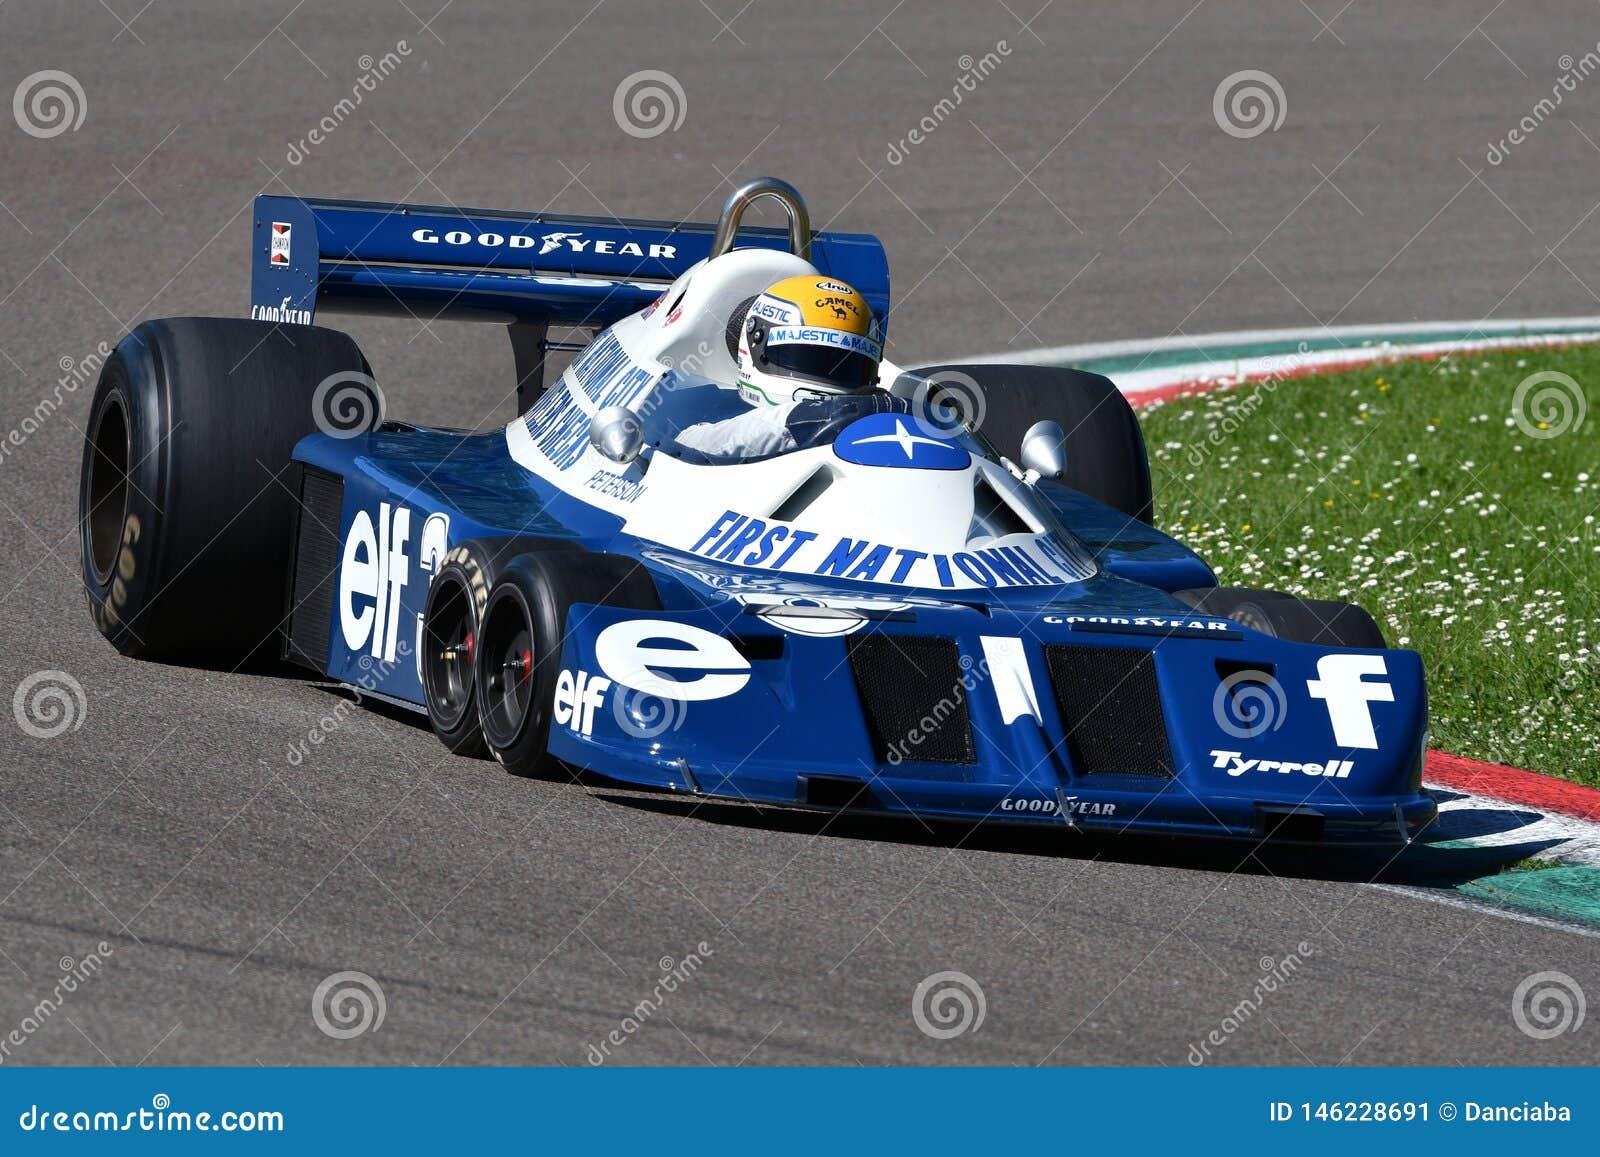 Imola 27 April 2019: Historisk 1976 f?re detta Ronnie Peterson som f?r F1 Tyrrell P34 ?r drivande vid Pierluigi Martini i handlin